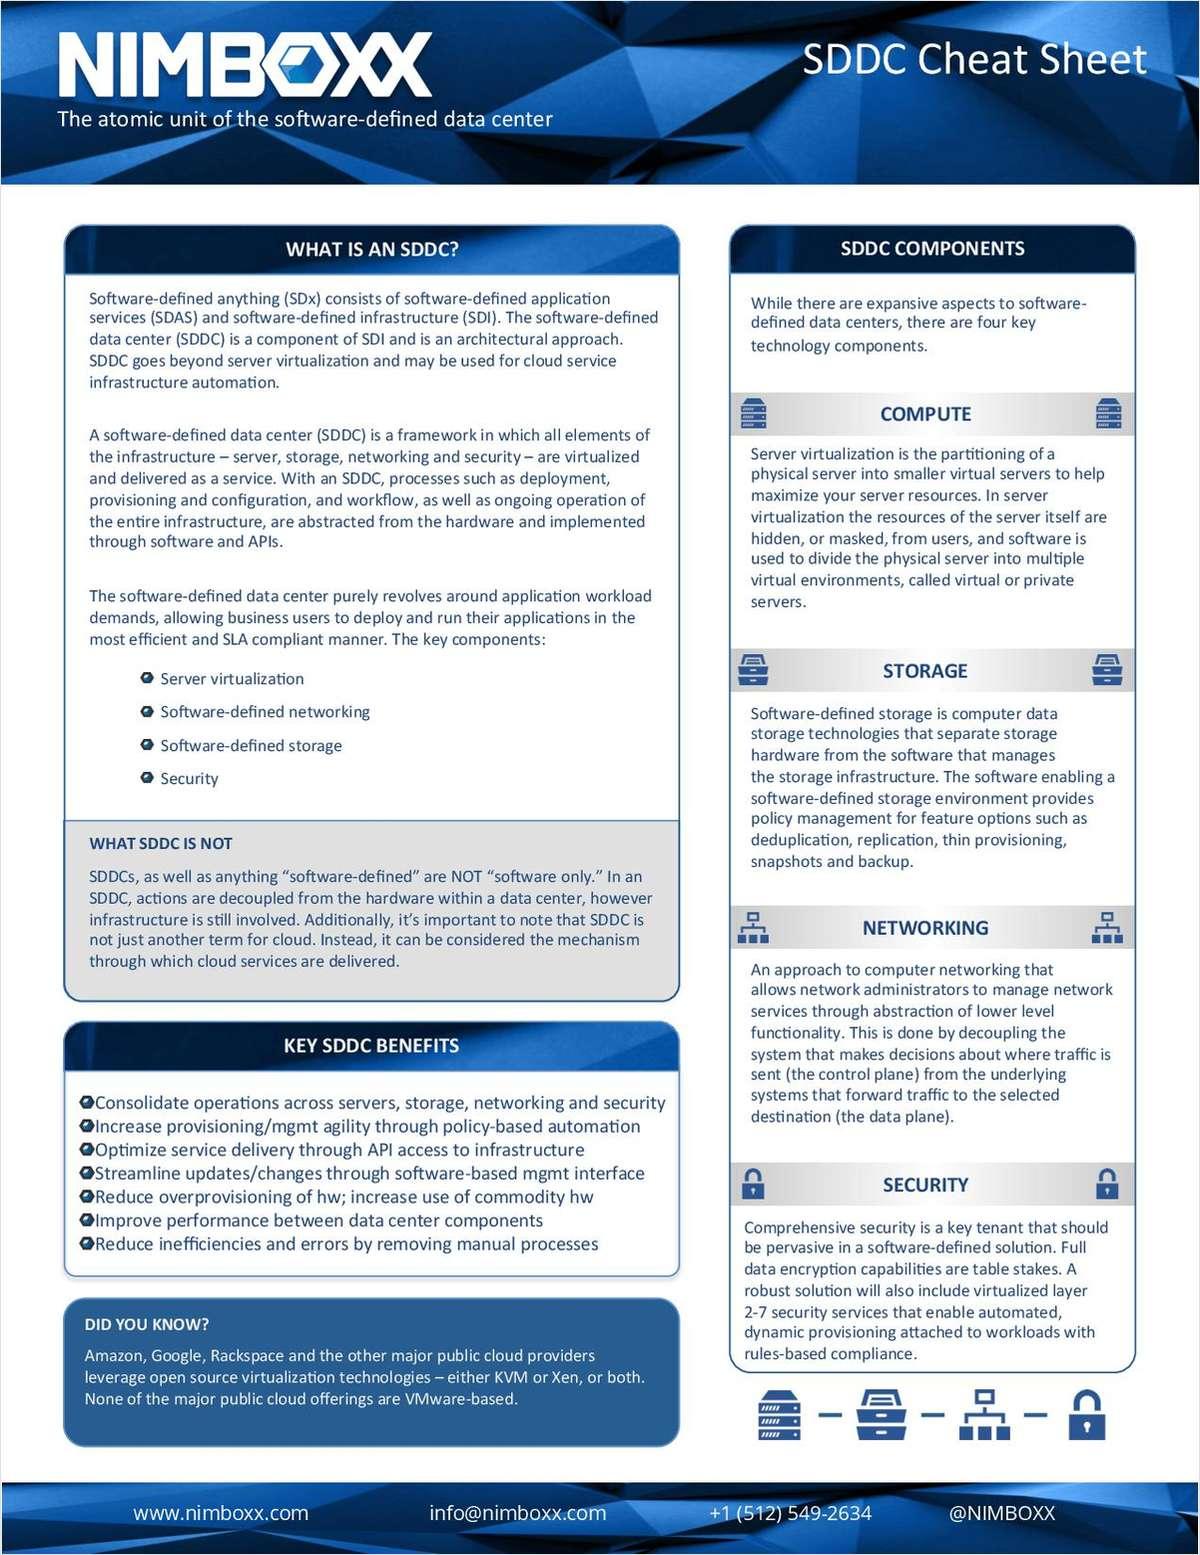 Free Software Defined Data Center (SDDC) Cheat Sheet